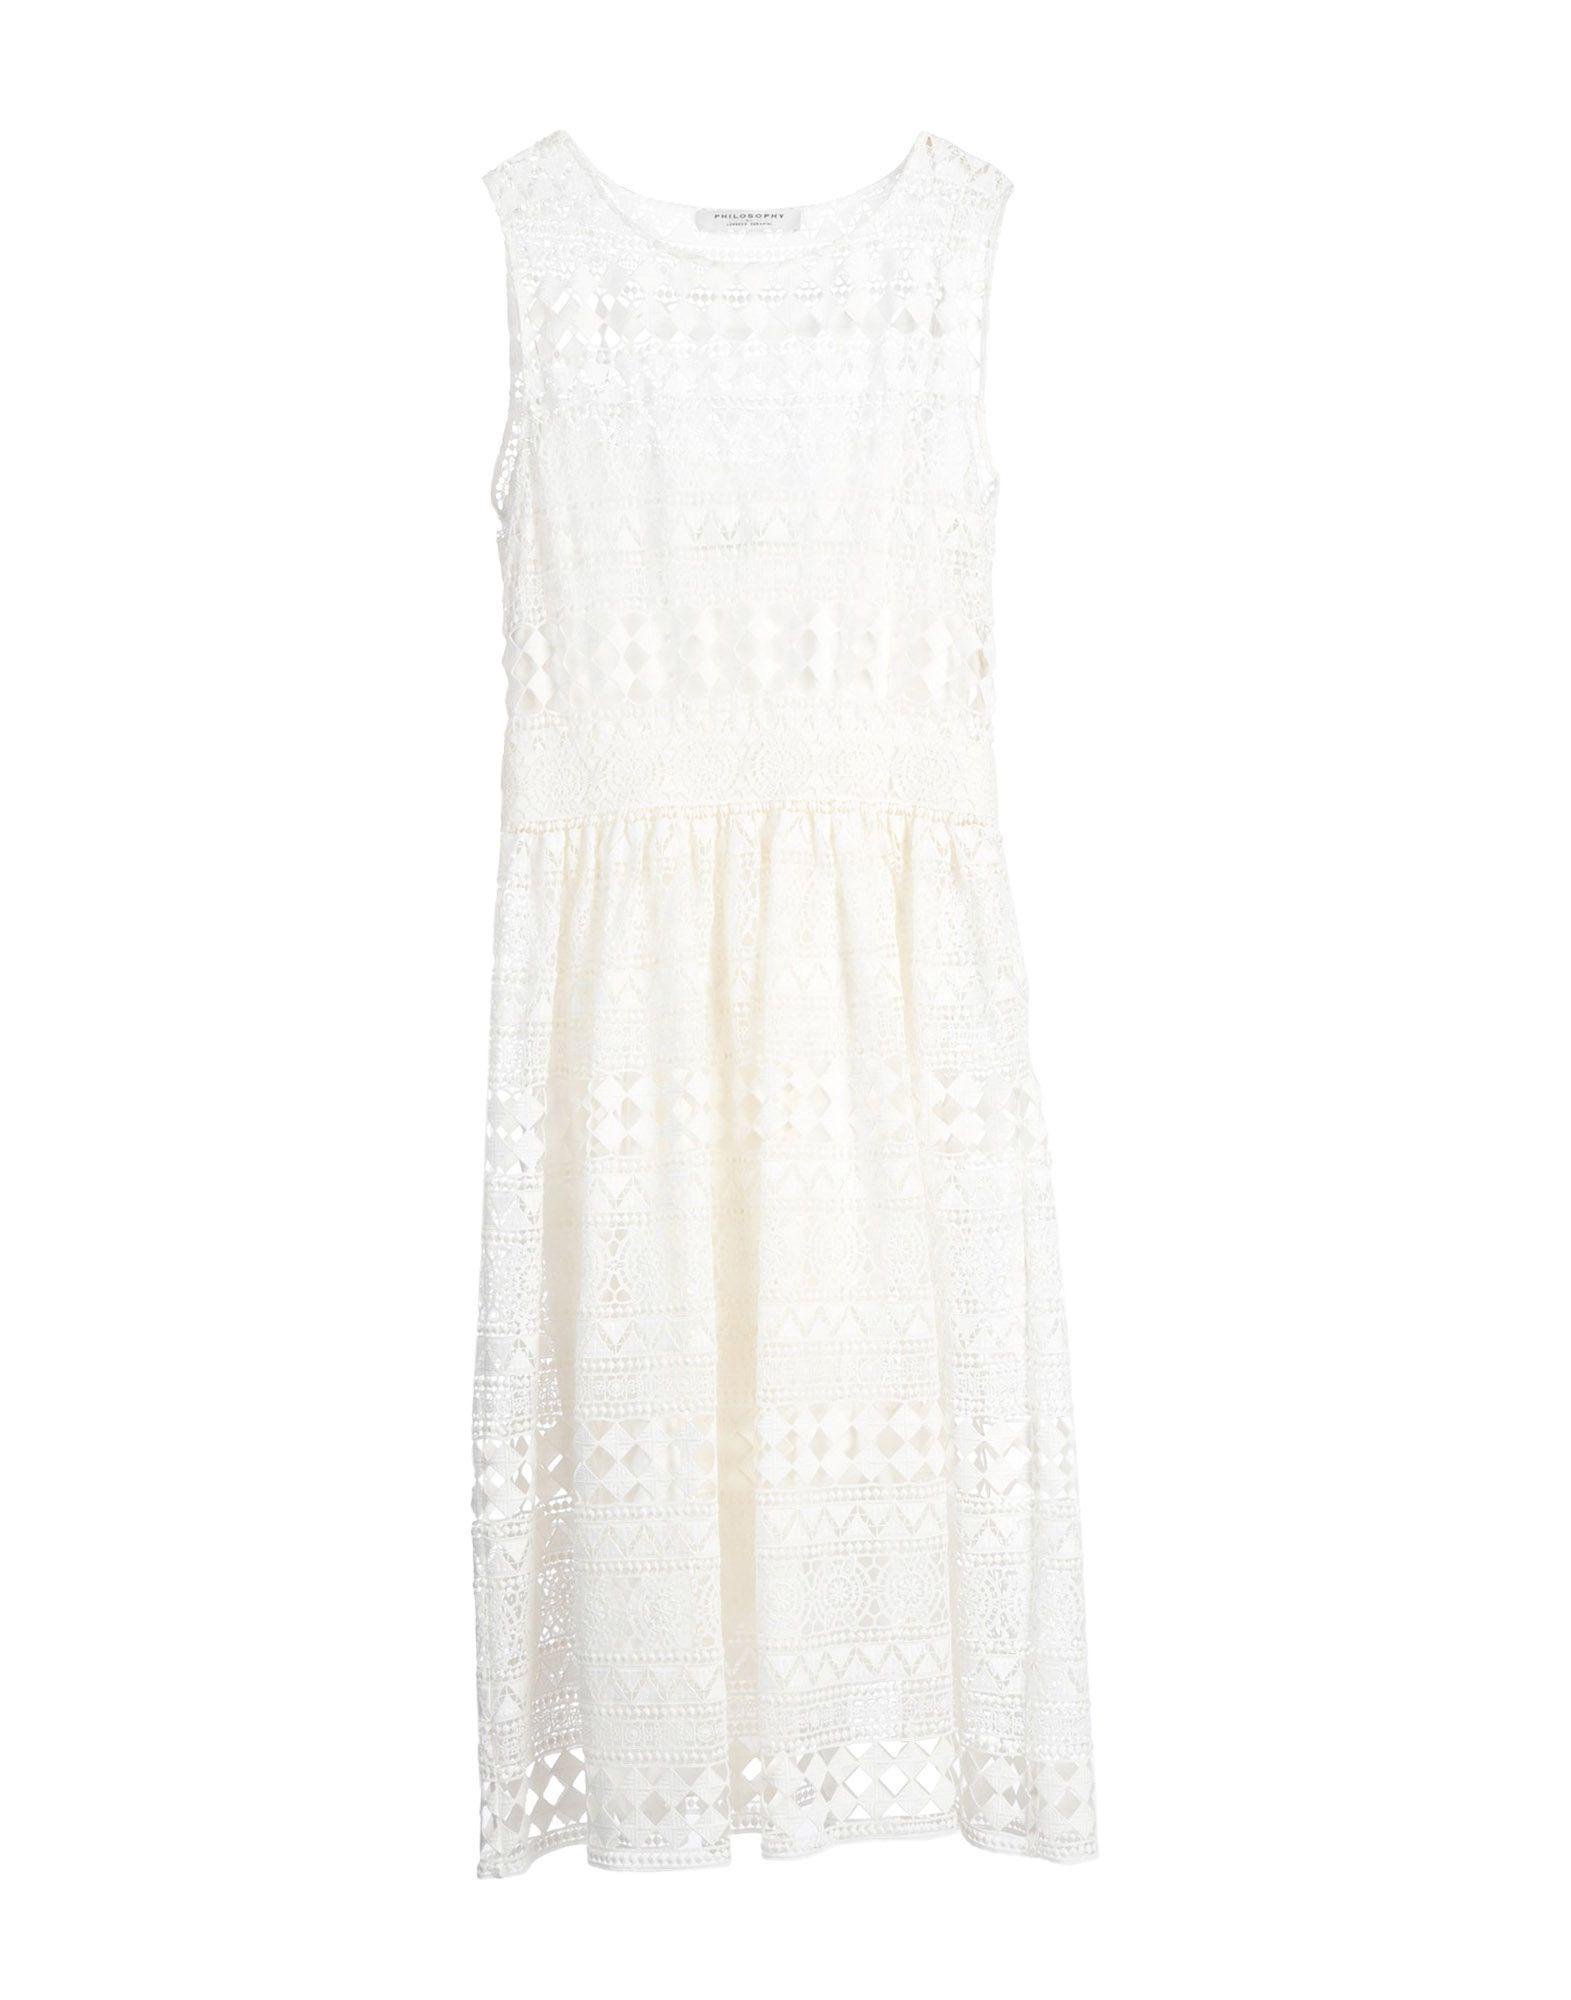 PHILOSOPHY di ALBERTA FERRETTI Платье длиной 3/4 платье af philosophy di a ferretti платья и сарафаны приталенные